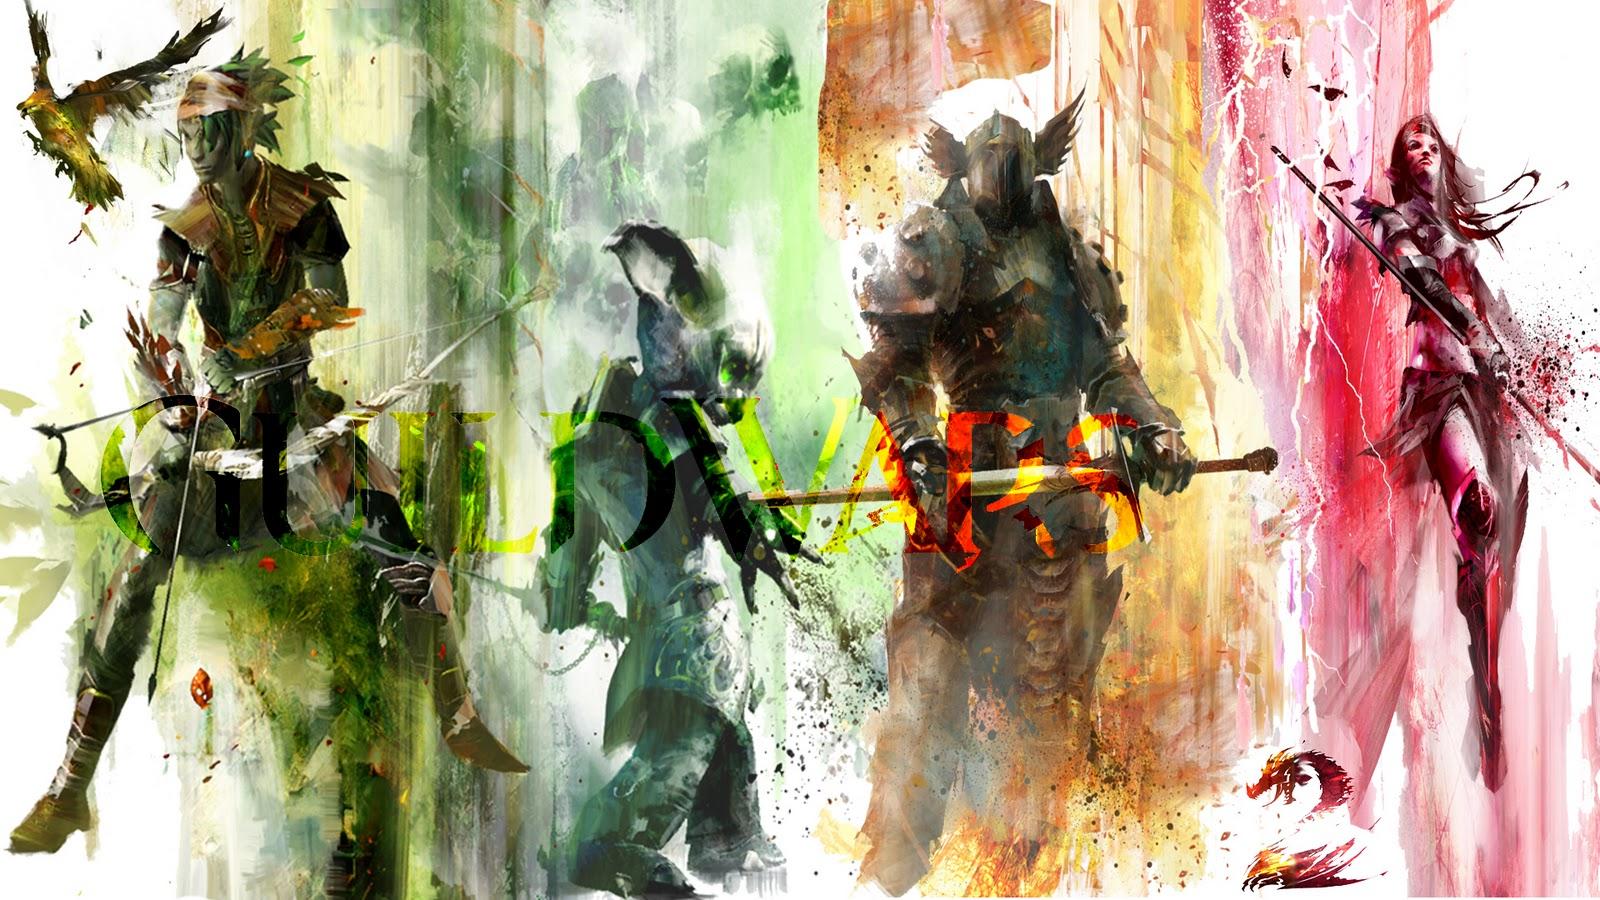 Guild Wars 2 Wallpaper: Gw2 Wallpaper Warrior